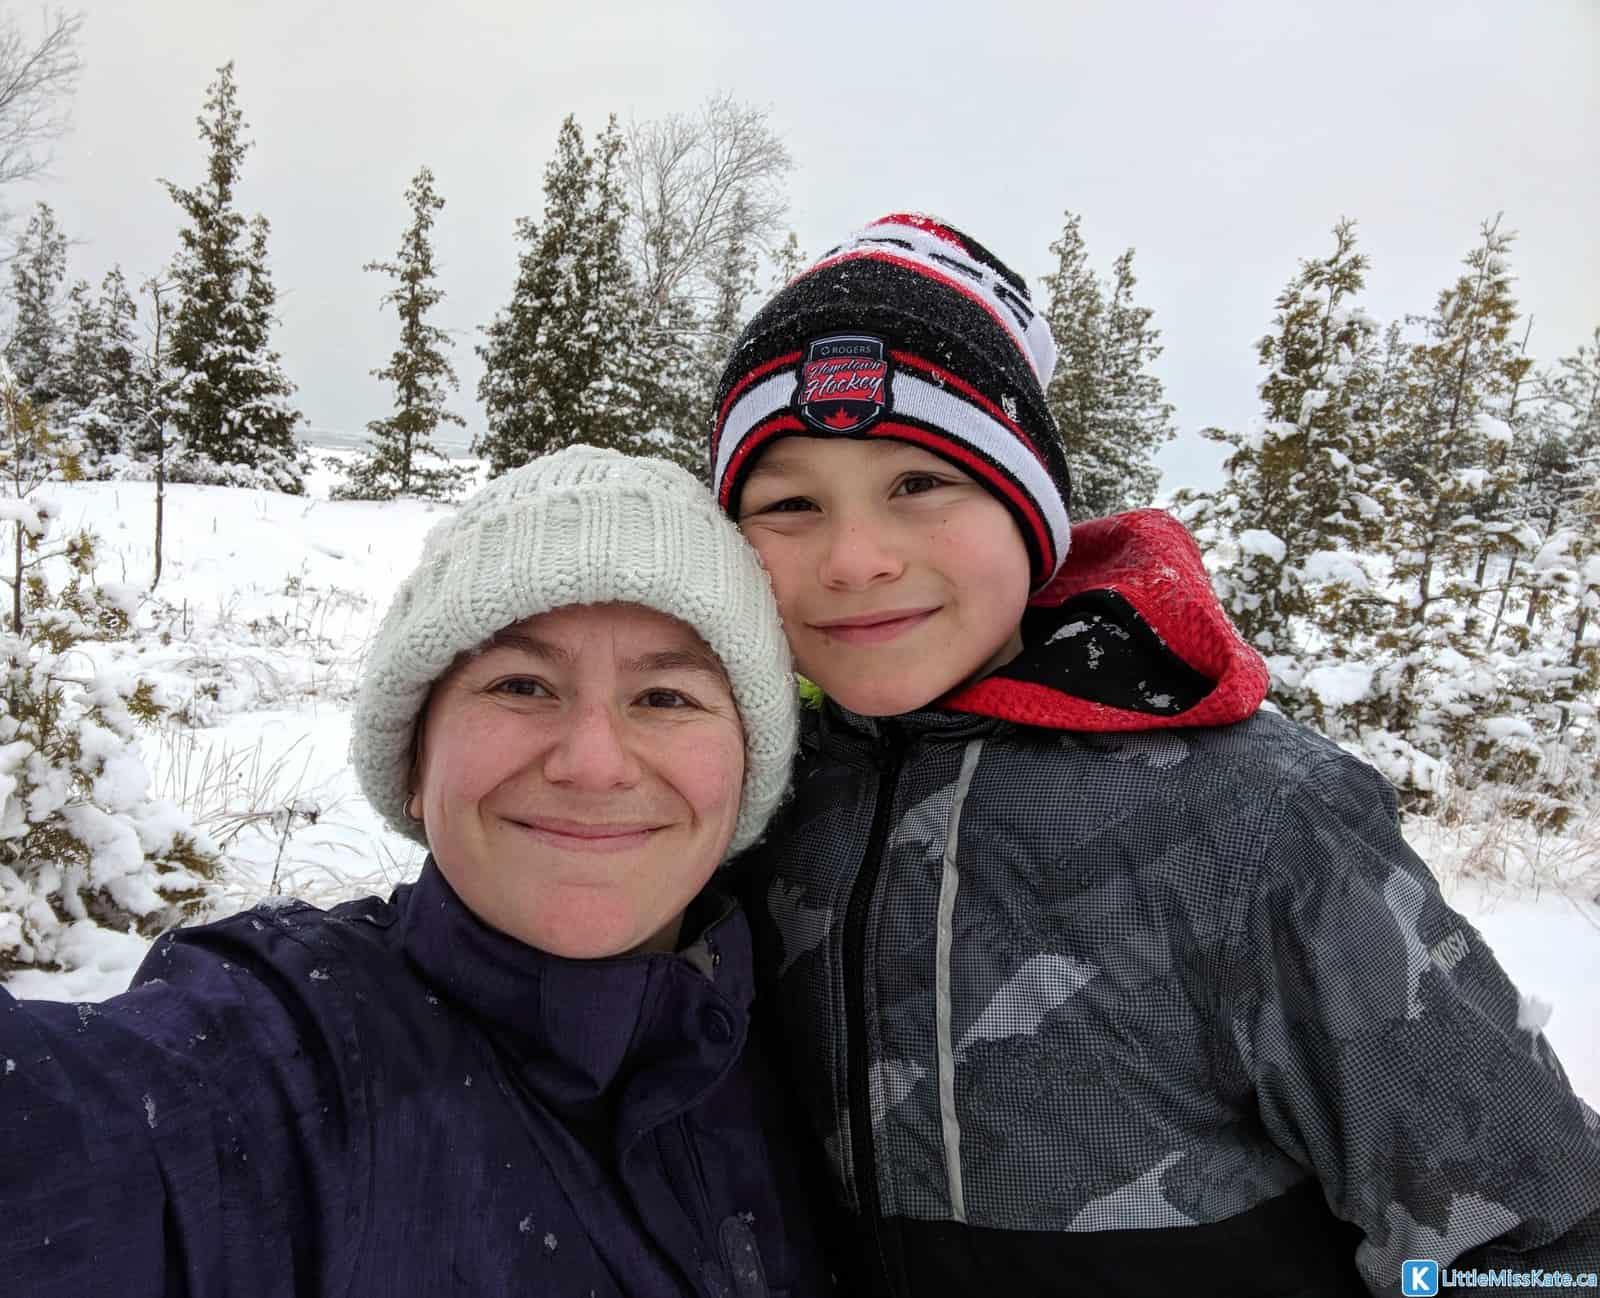 Winter camping in ontario macgregor point provincial park